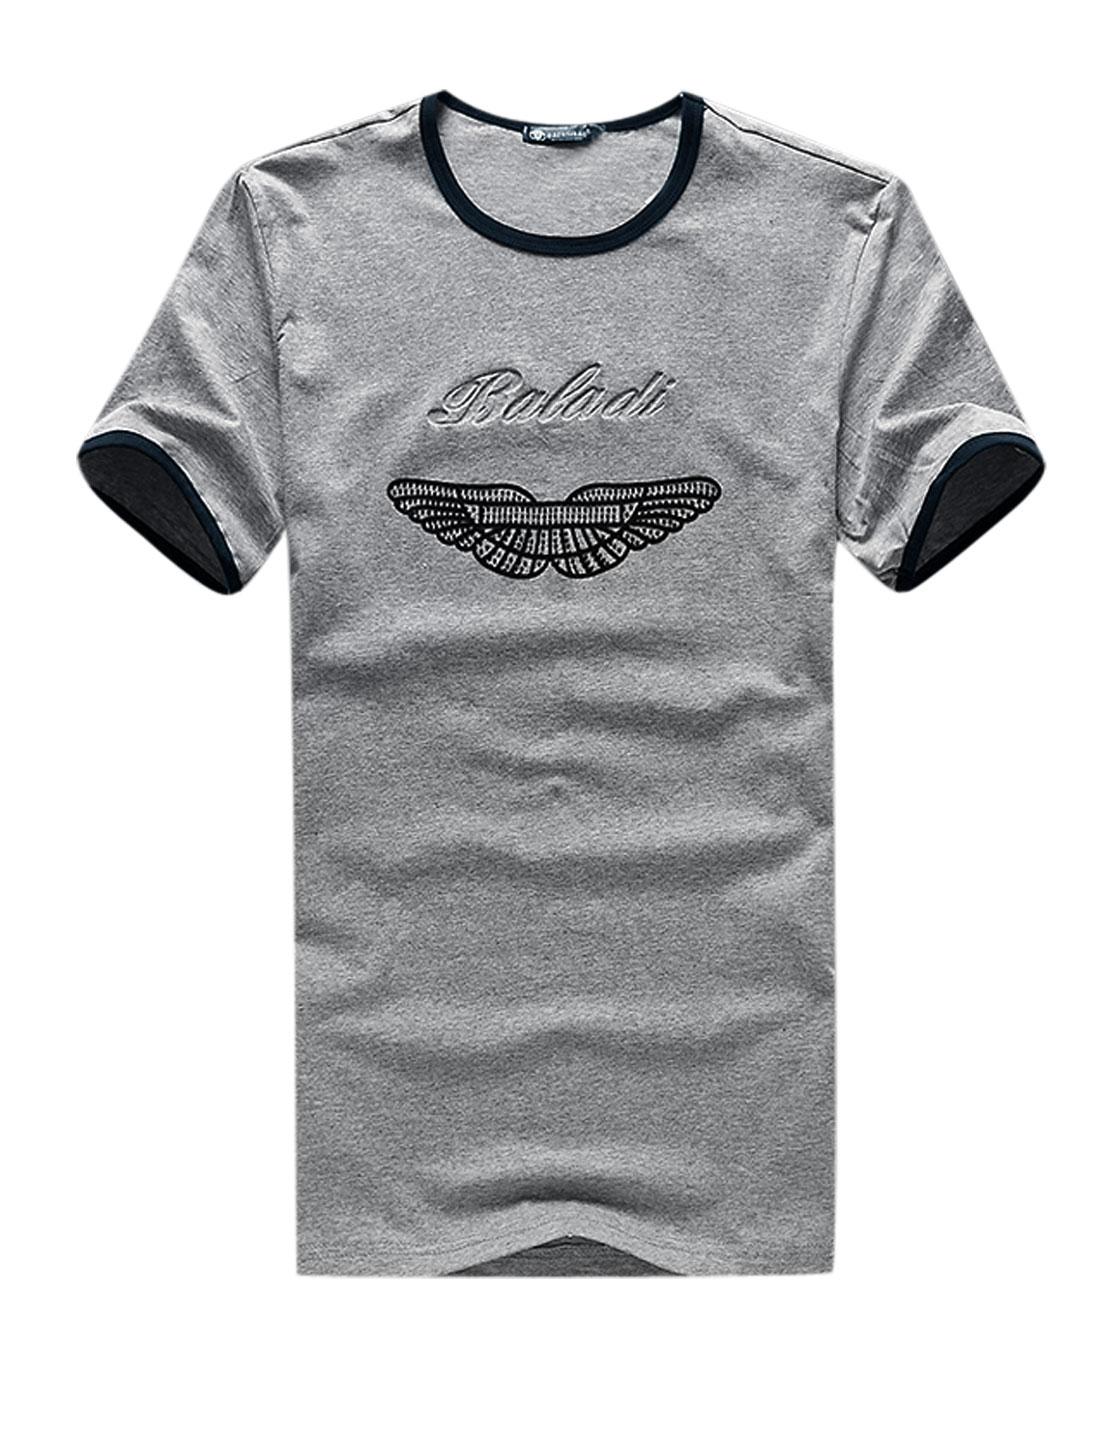 Men Round Neck Novelty Print Casual Summer T-Shirt Gray M